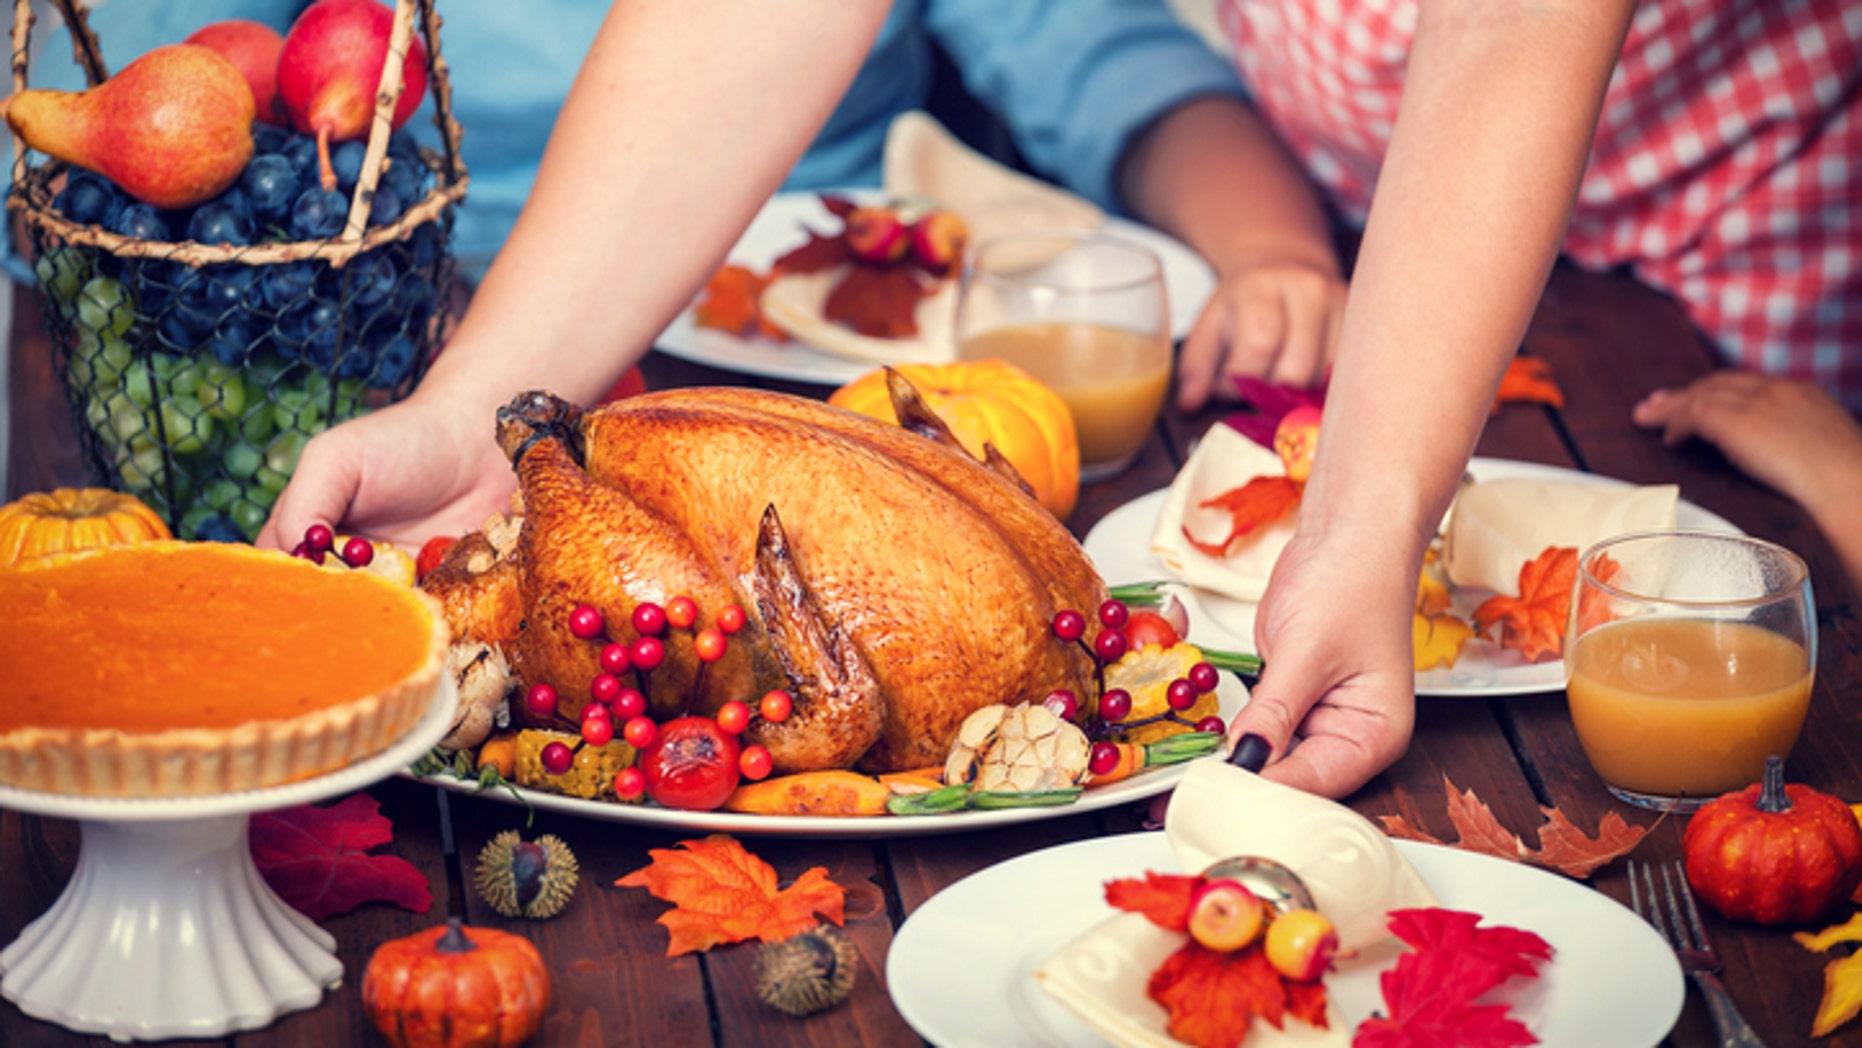 Strangers are welcome at one Arizona grandma's feast.